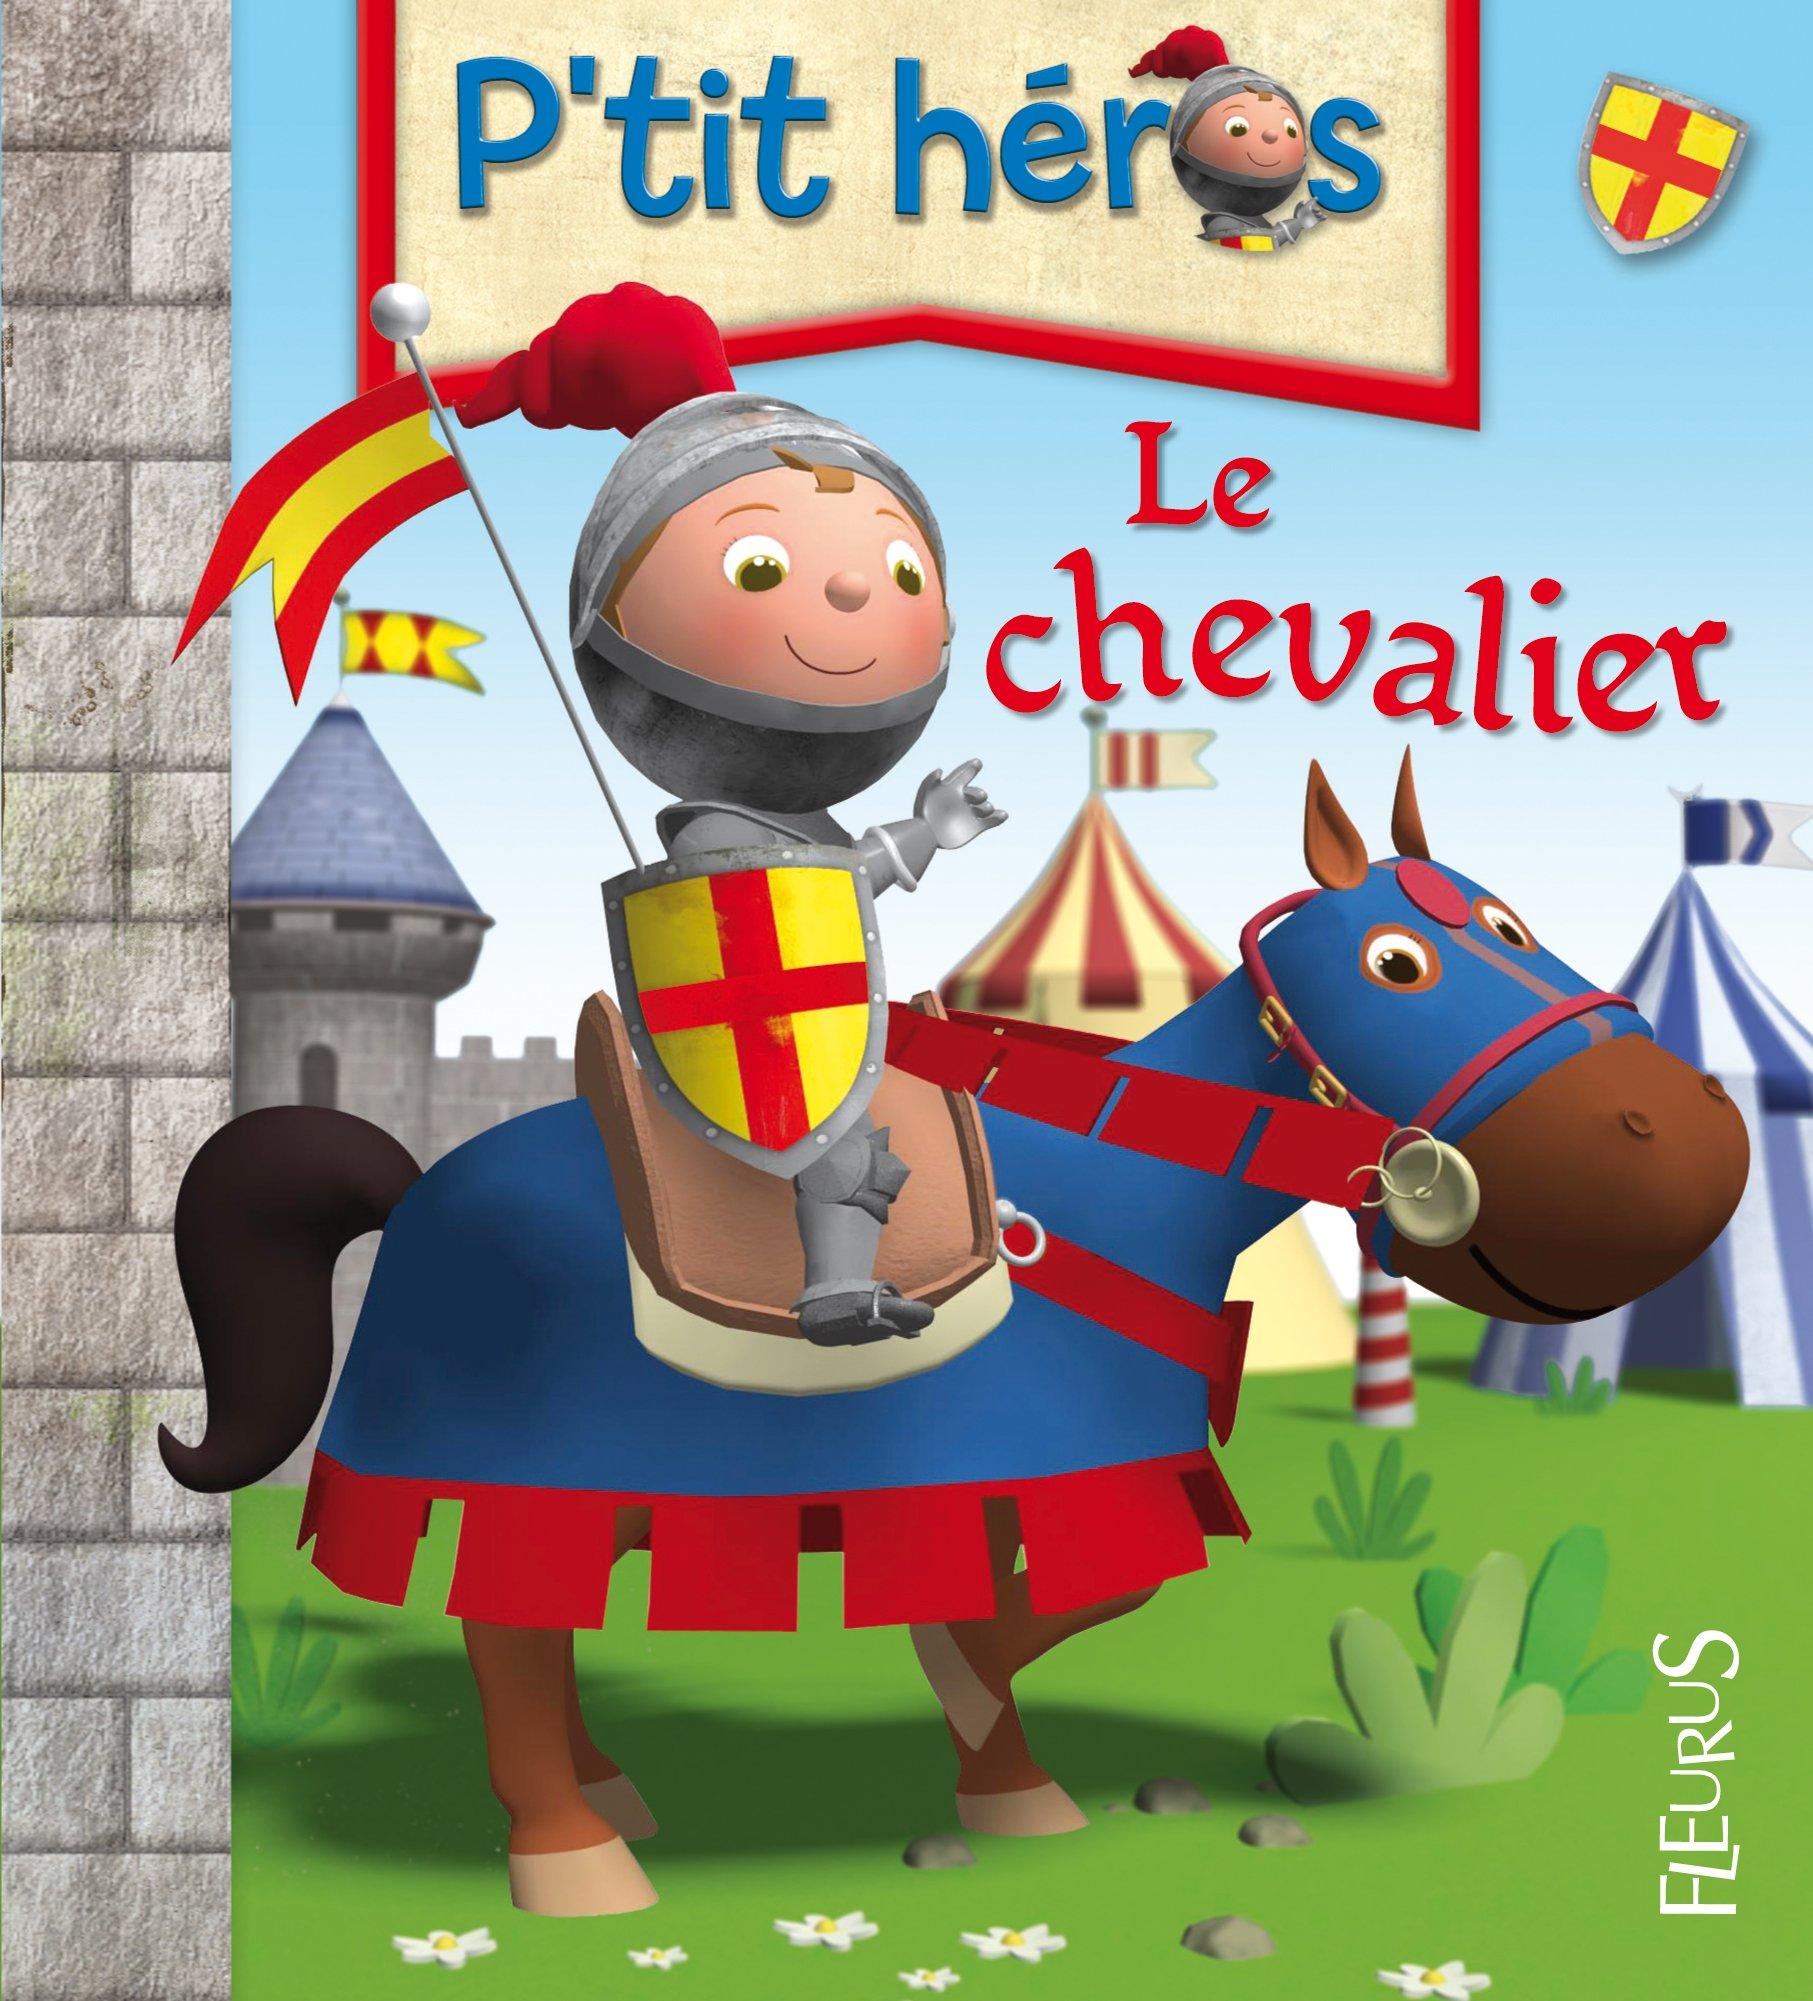 Le chevalier (French Edition) ePub fb2 ebook